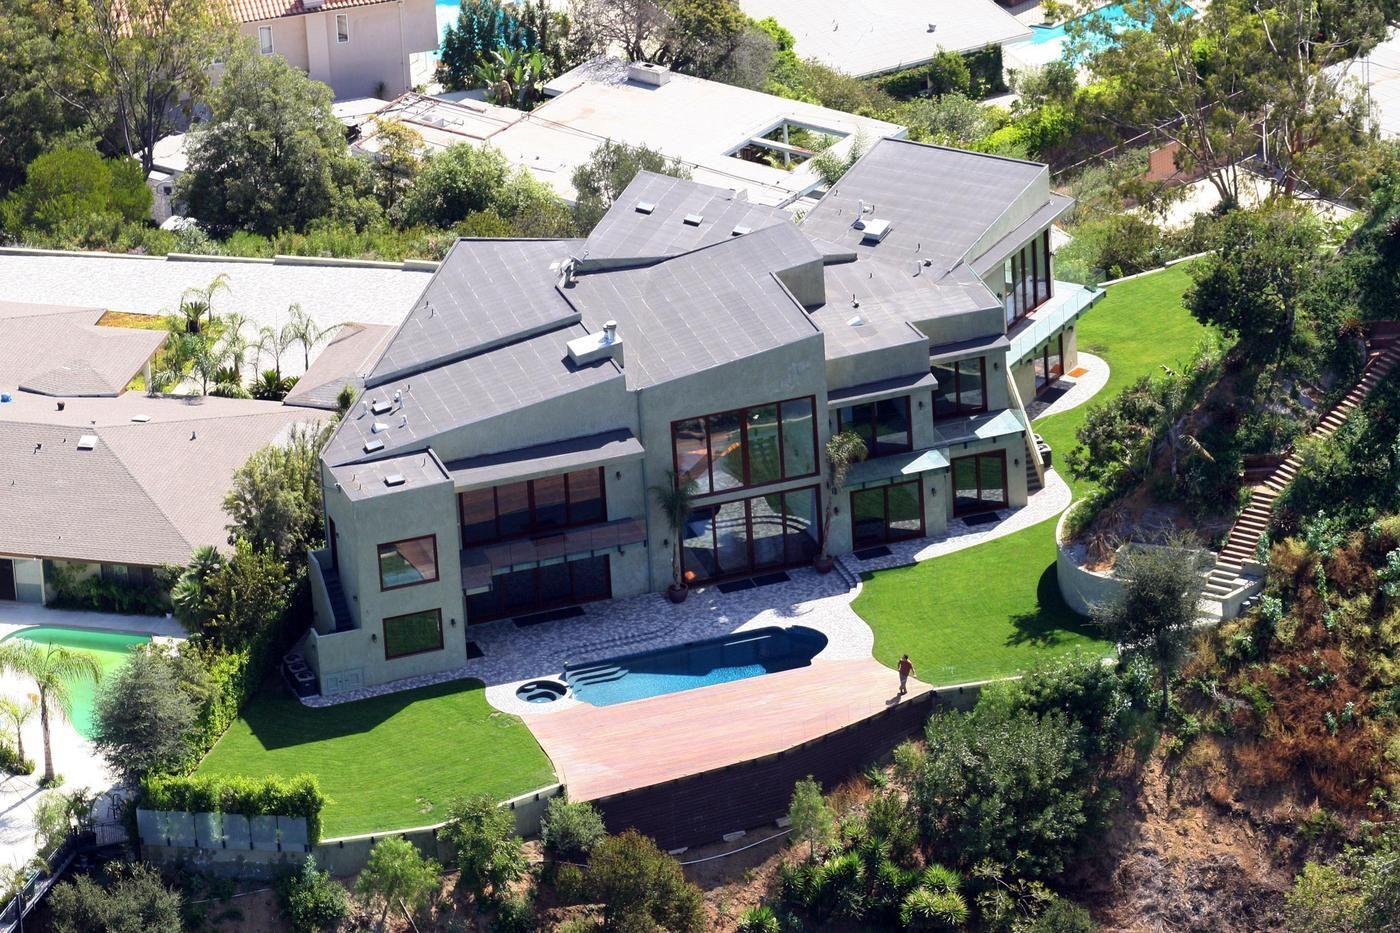 Hollywood hills mansion brand new 10 million 8 bedroom - 8 bedroom homes for sale in los angeles ...